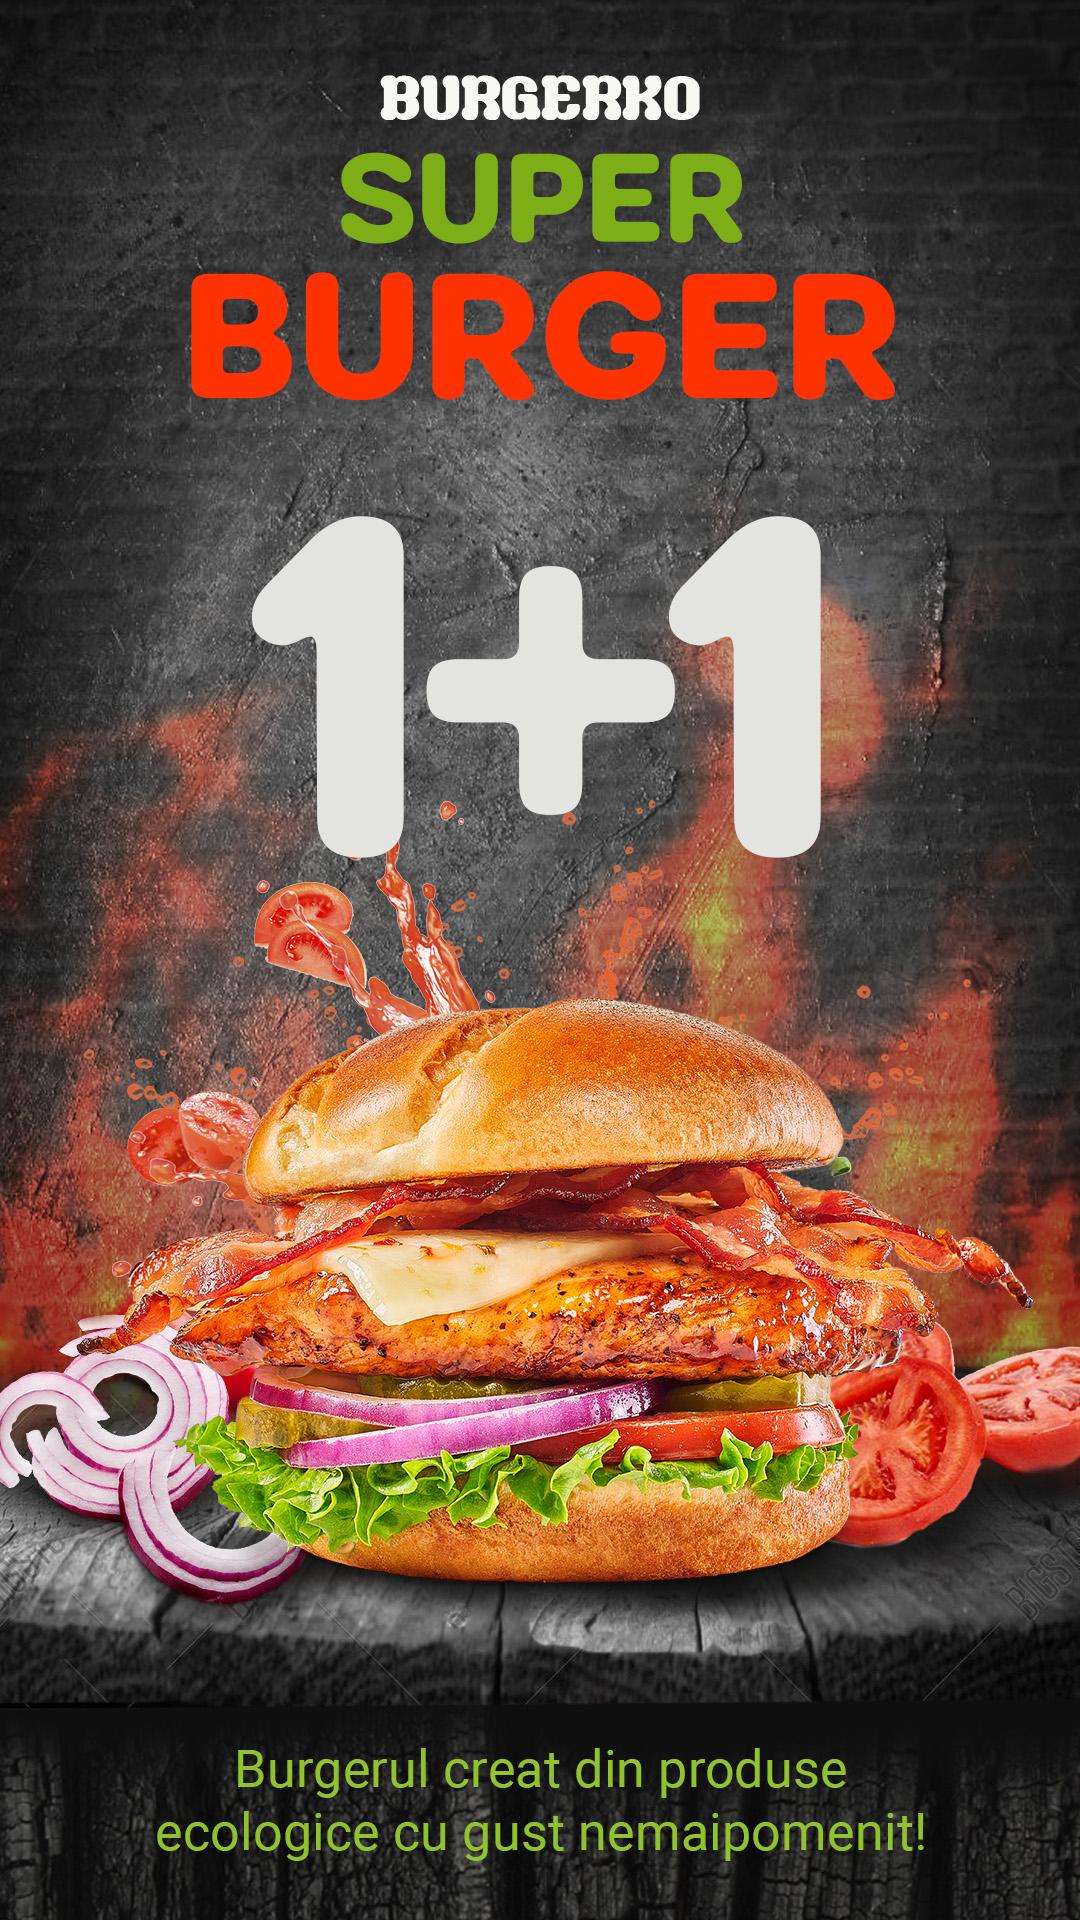 Burgerko Burger Banner